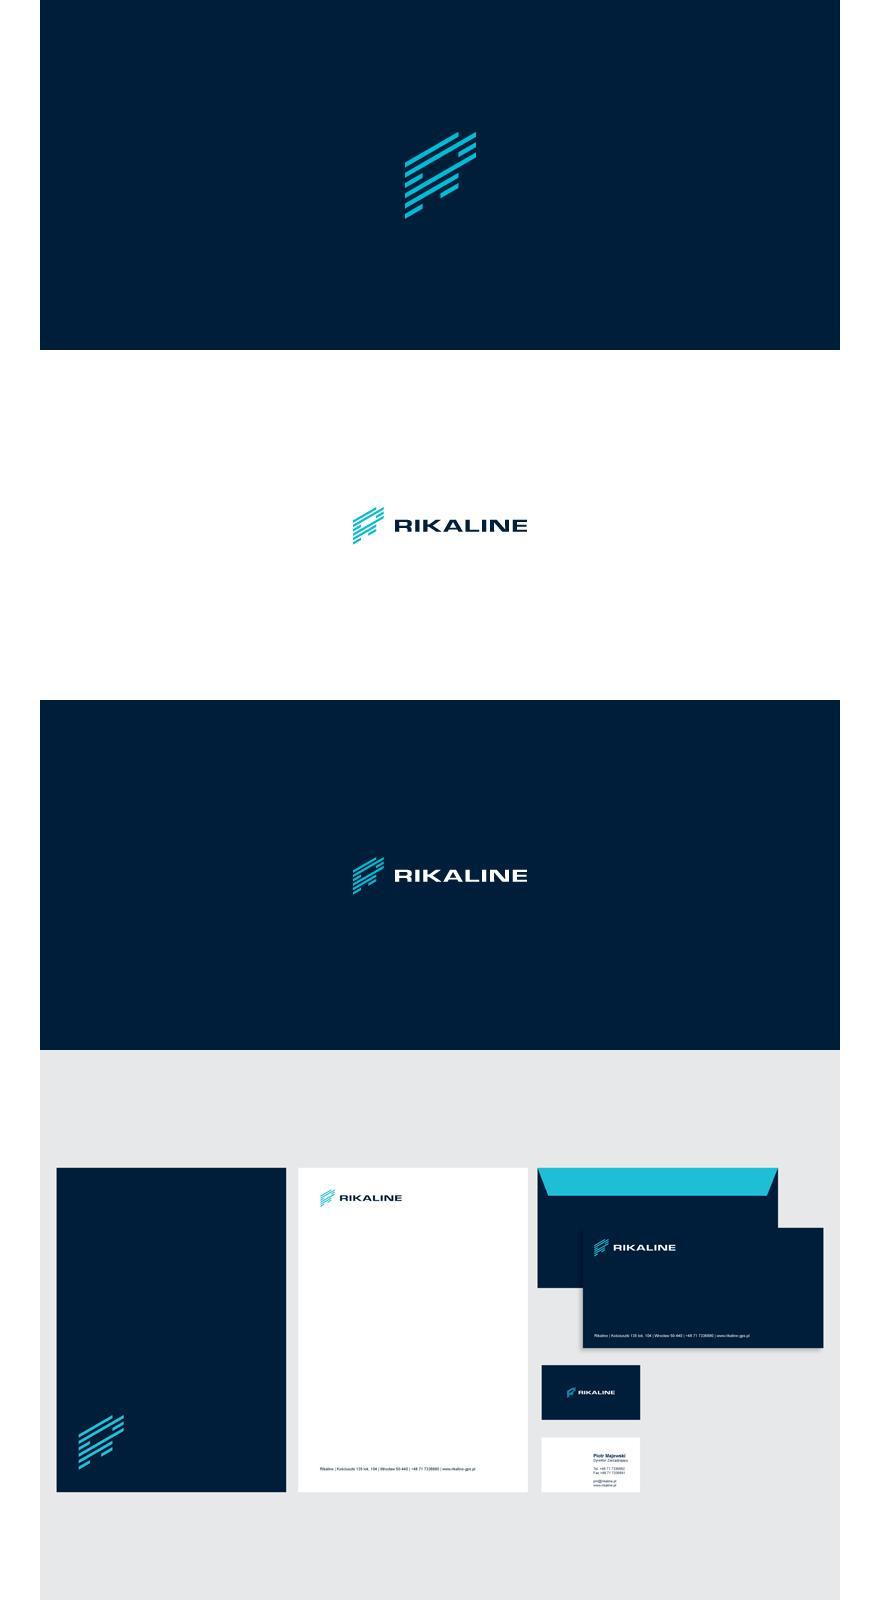 RIKALINE | visual identity - Logos - Creattica